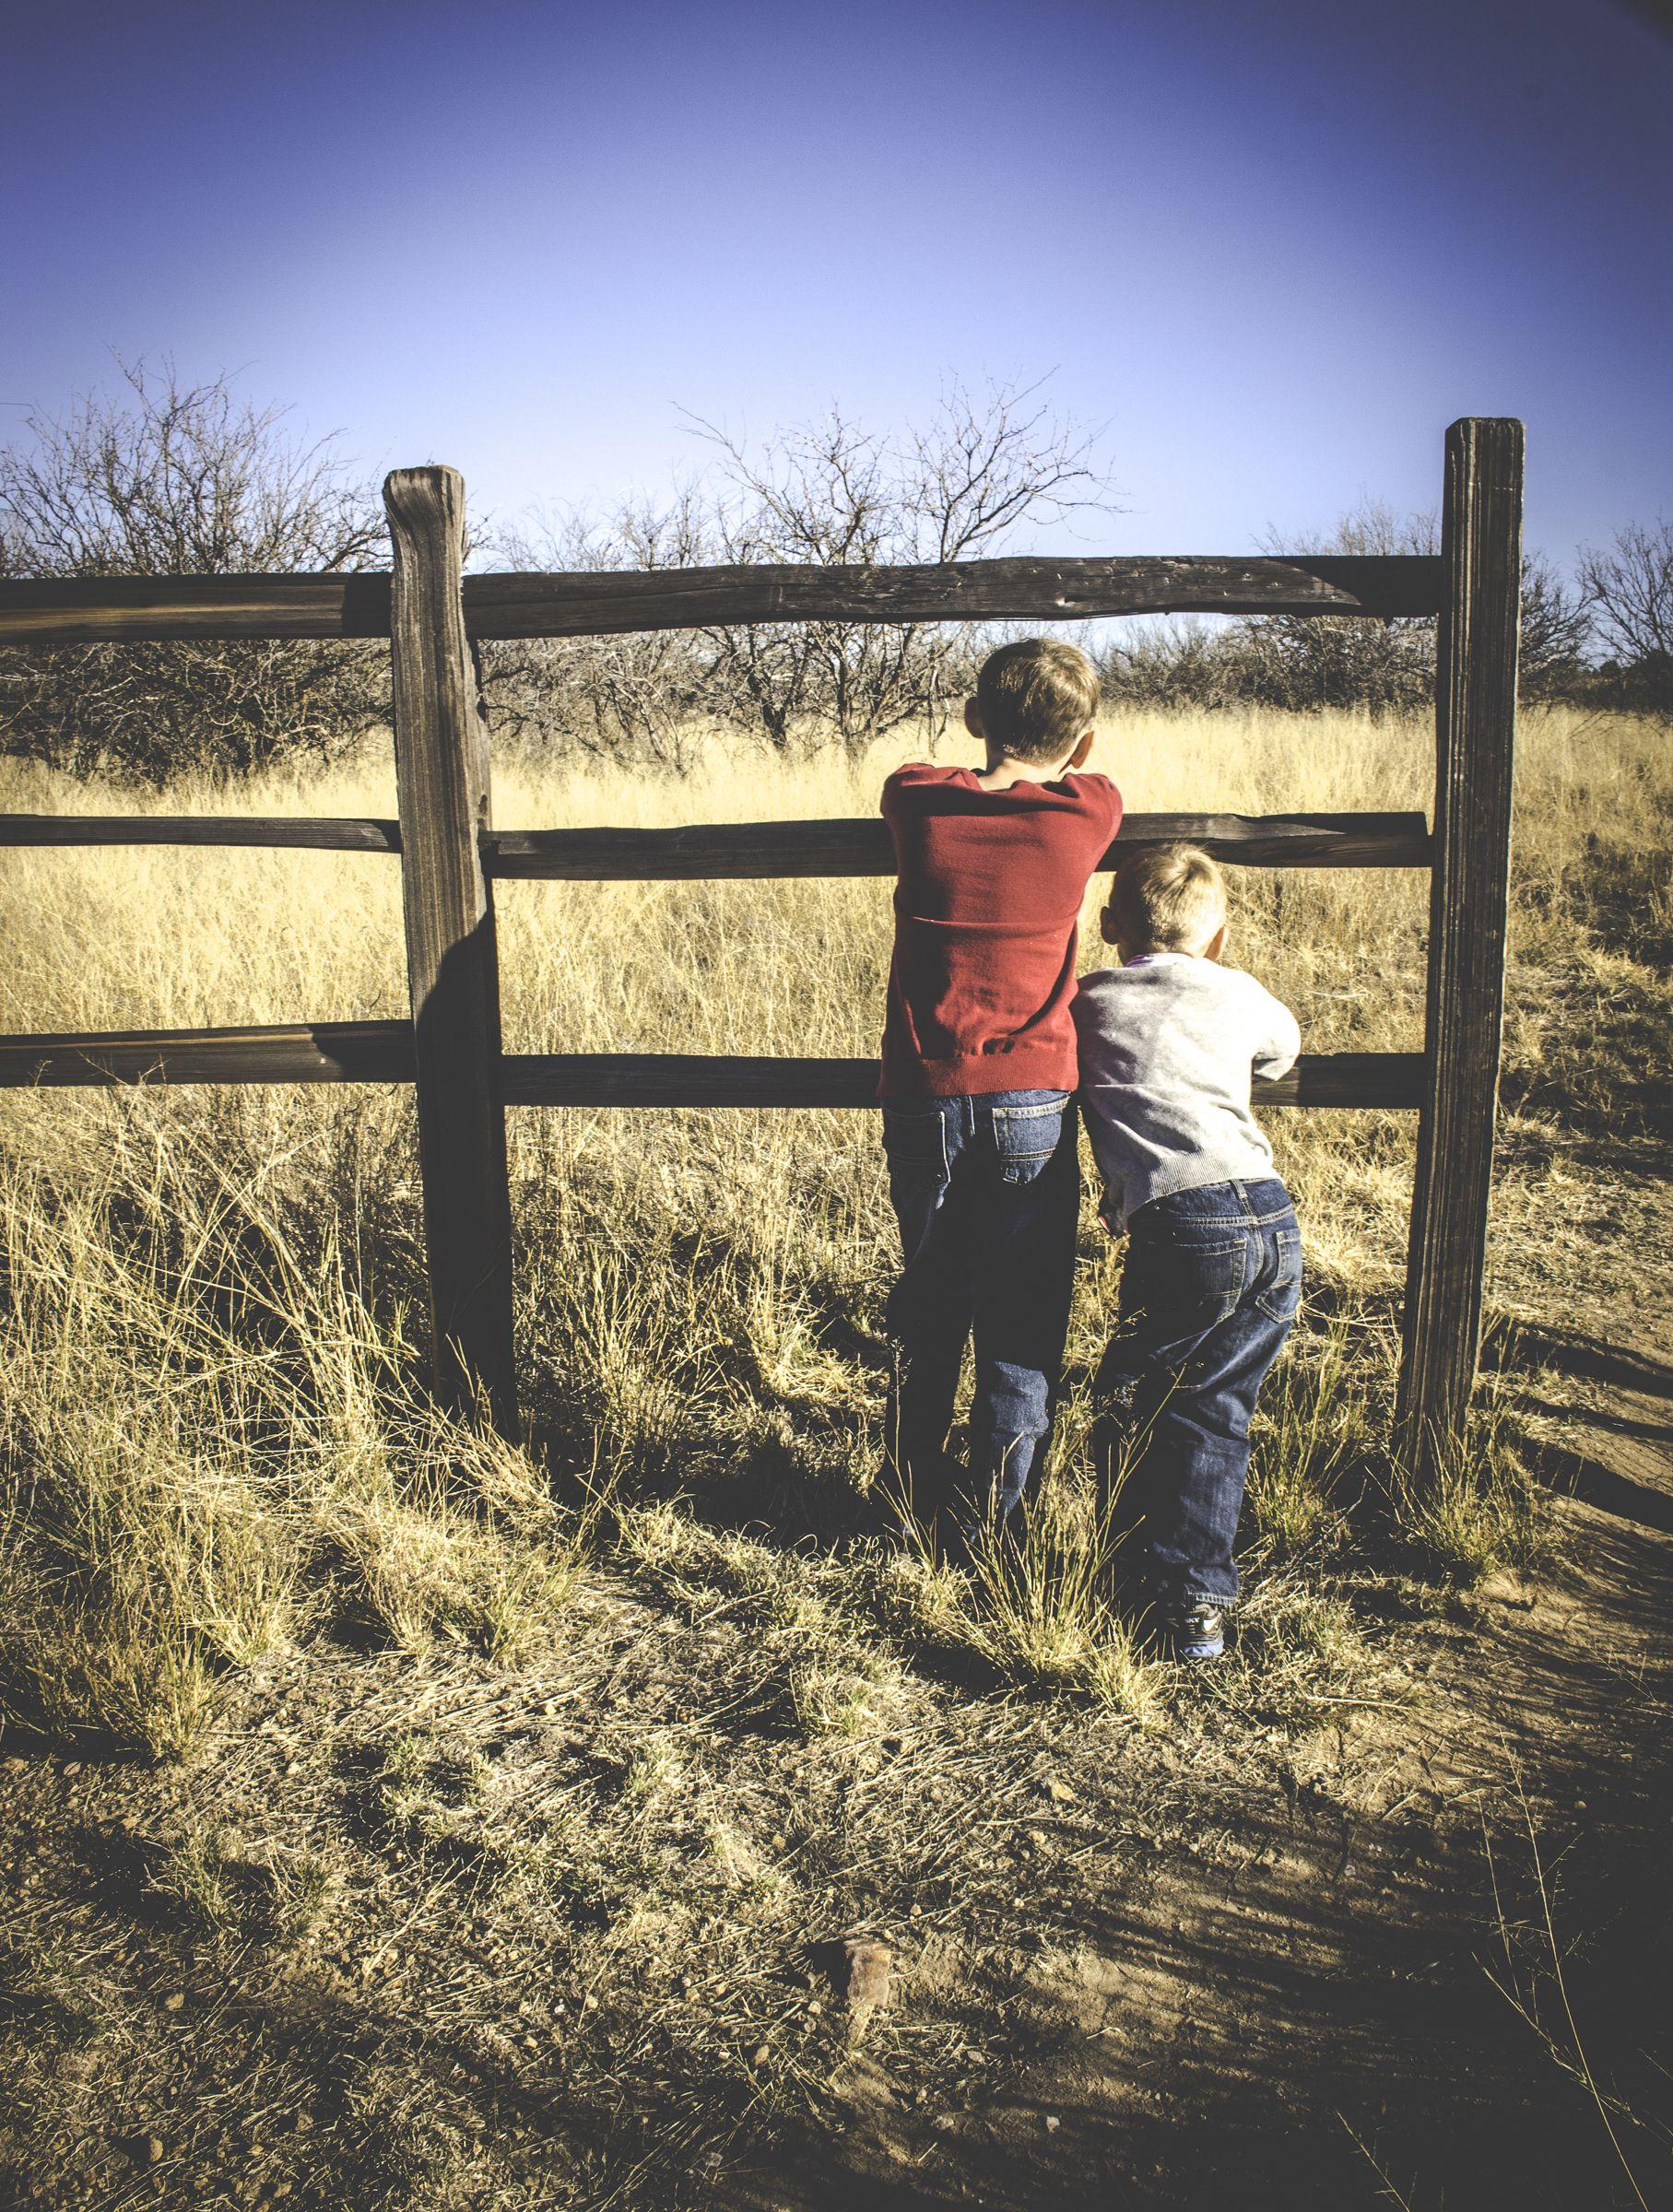 Melissa Riggins Photography (melissarigginsphotography.com)